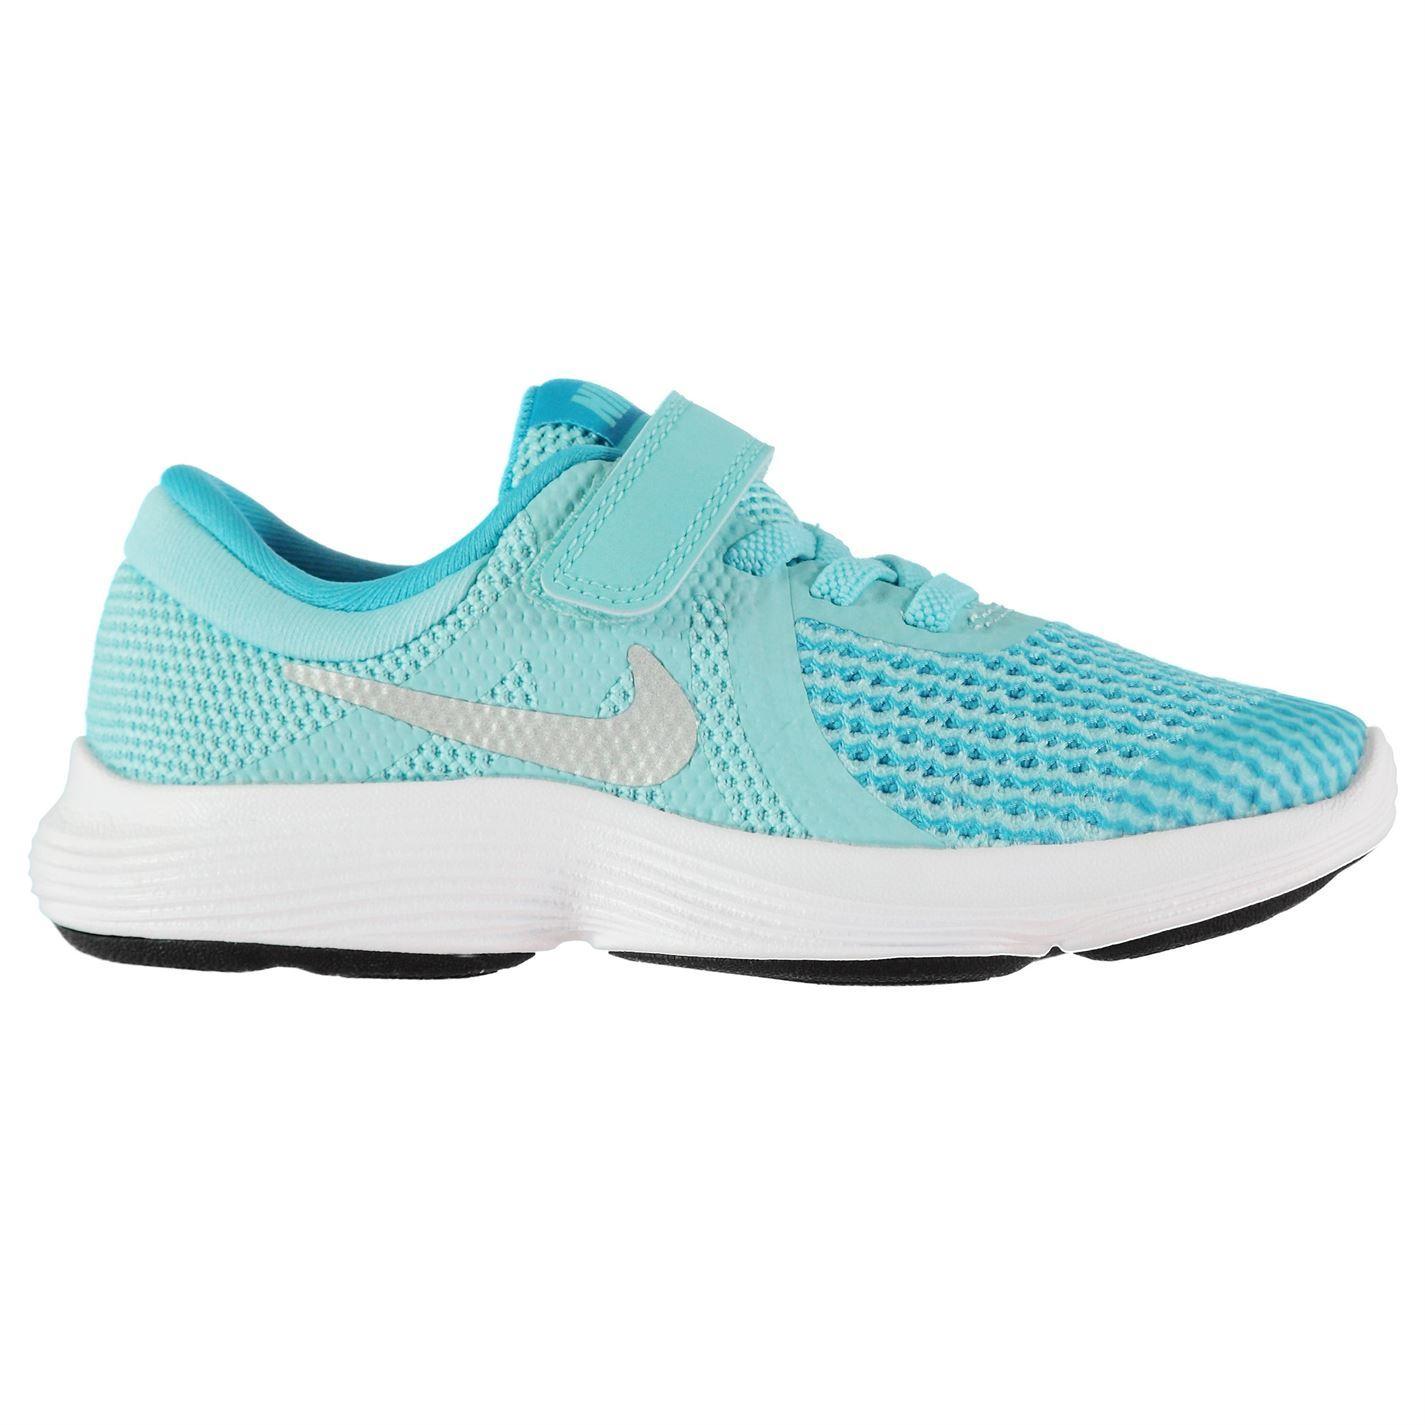 Nike Revolution 4 Child Girls Trainers BlueSilver Shoes Footwear